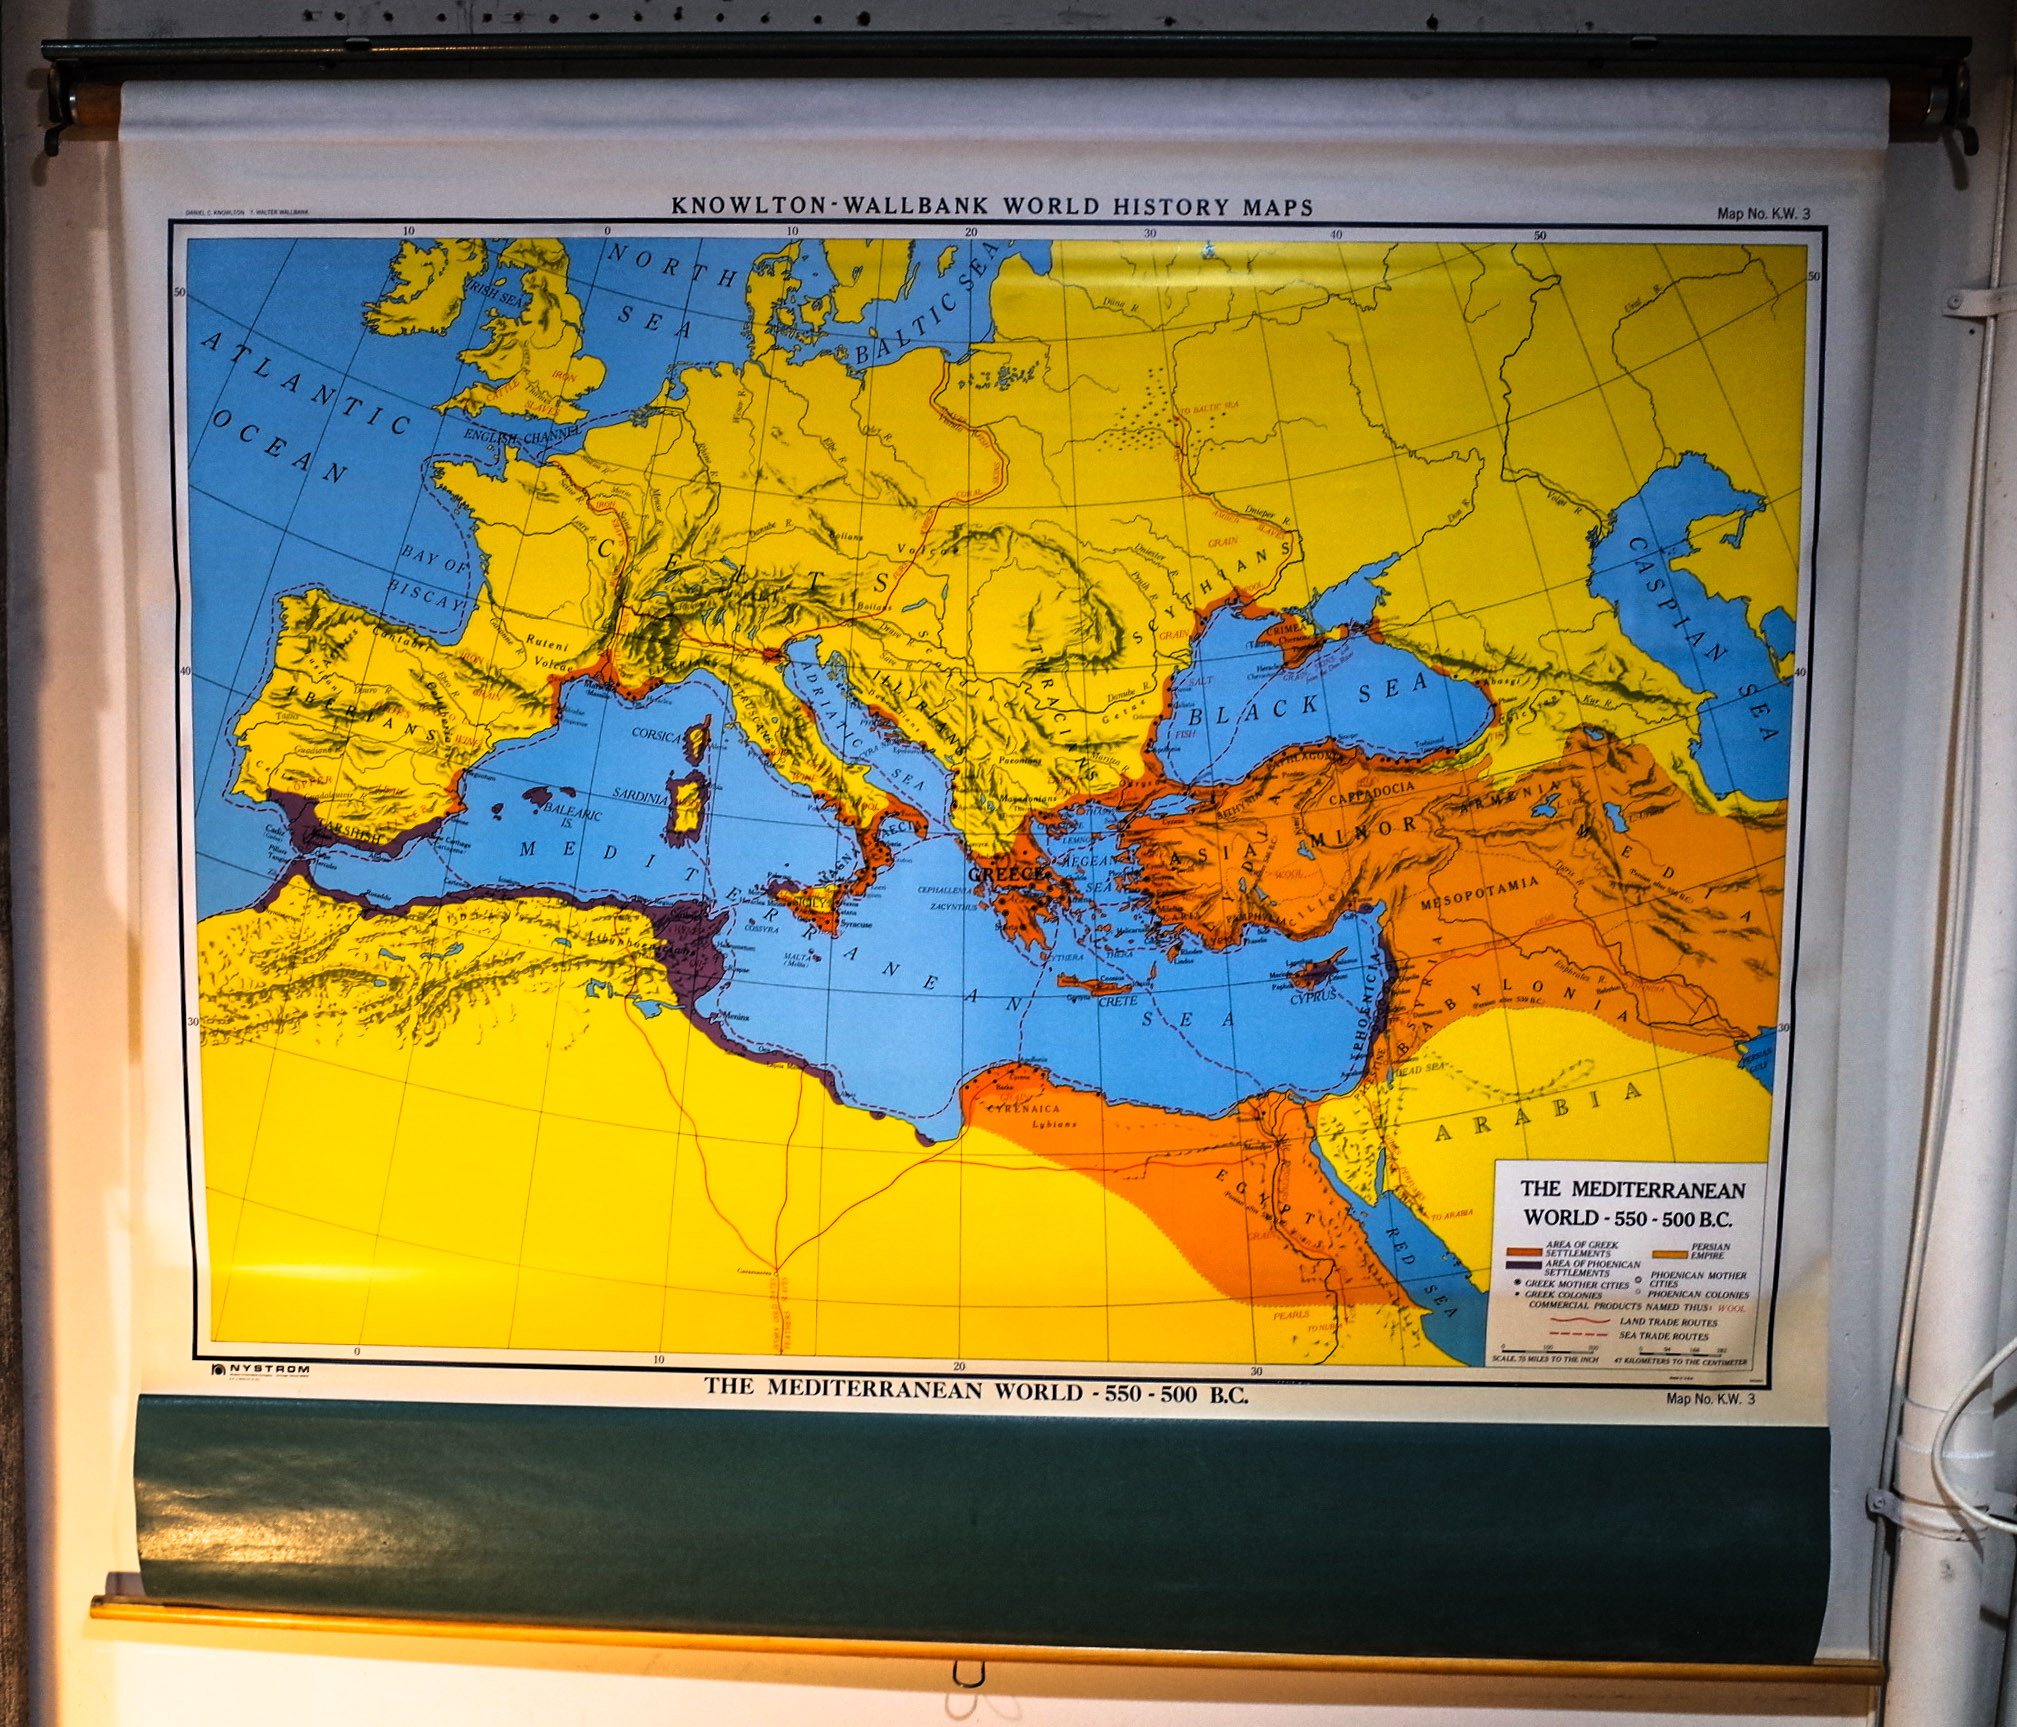 the-mediterranean-world-knowlton-wallbank-world-history-maps.jpg